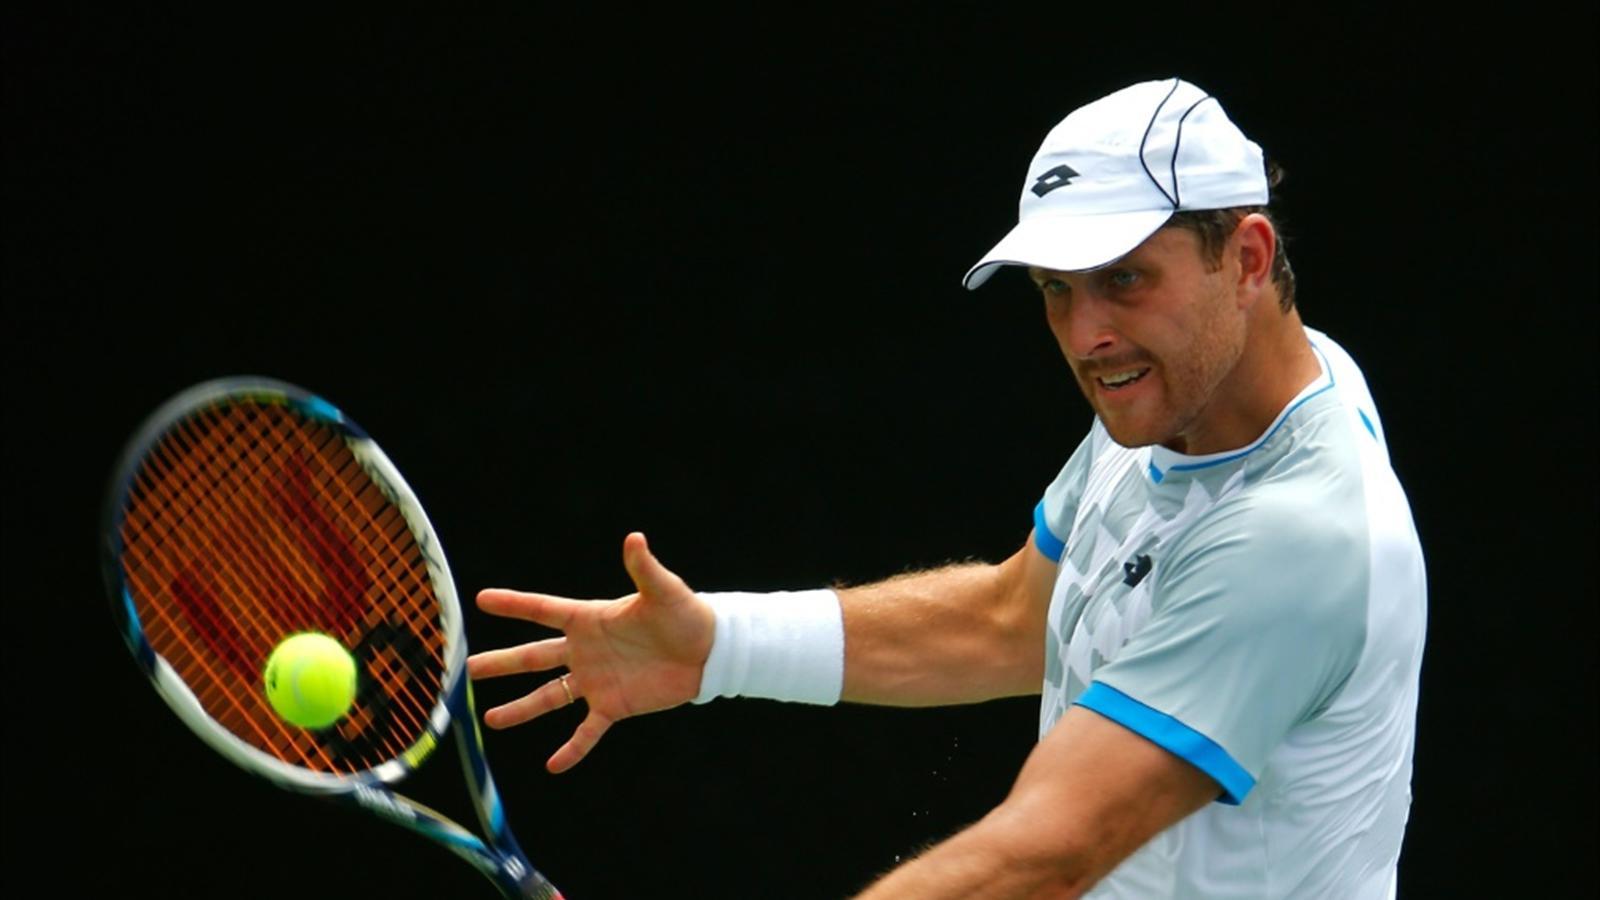 ATP Estoril: Benjamin Becker und Michael Berrer früh gescheitert - ATP Estoril 2016 - Tennis ...